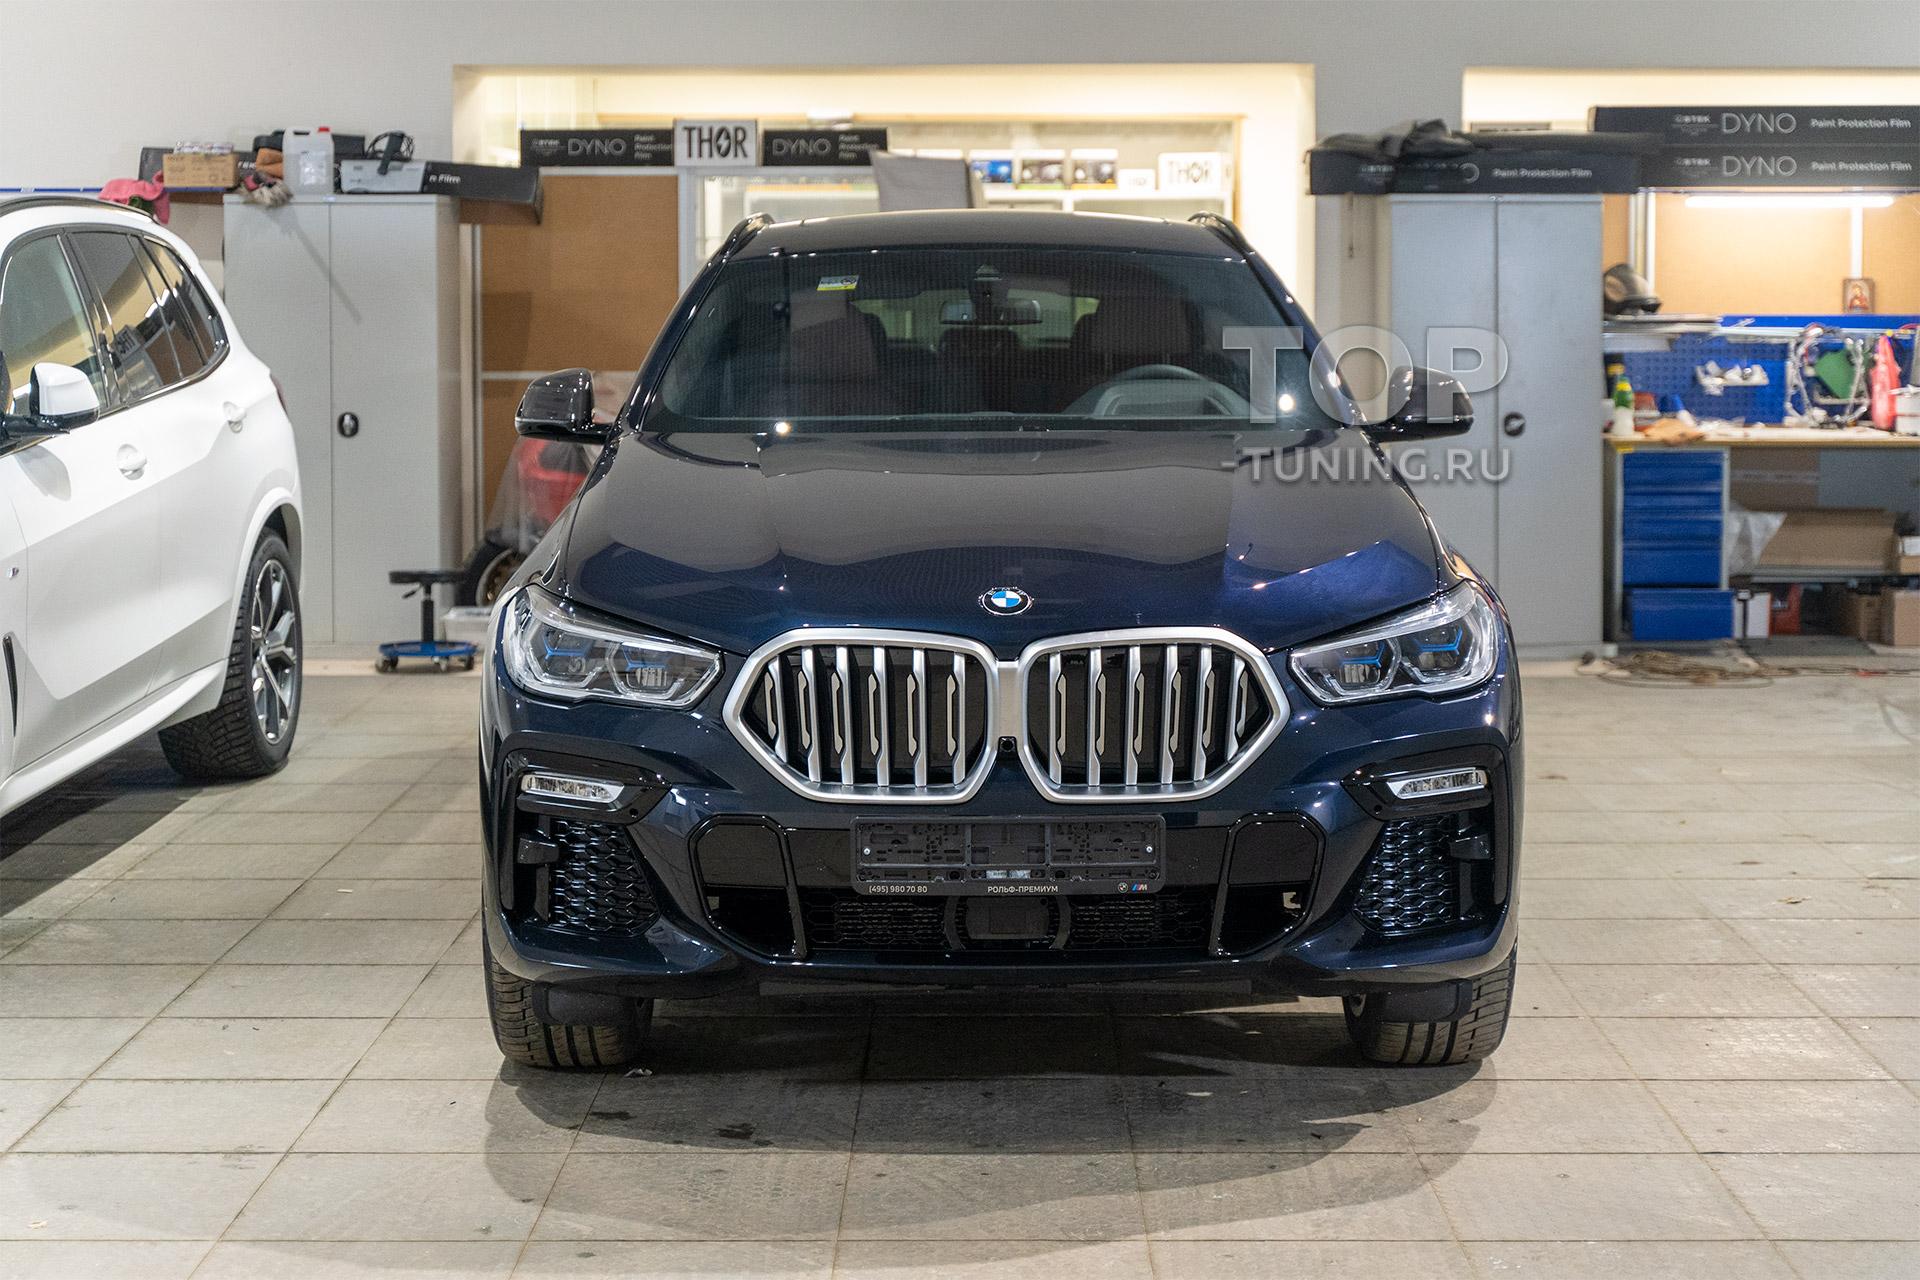 105757 Защита, шумоизоляция и тюнинг BMW X6 G06